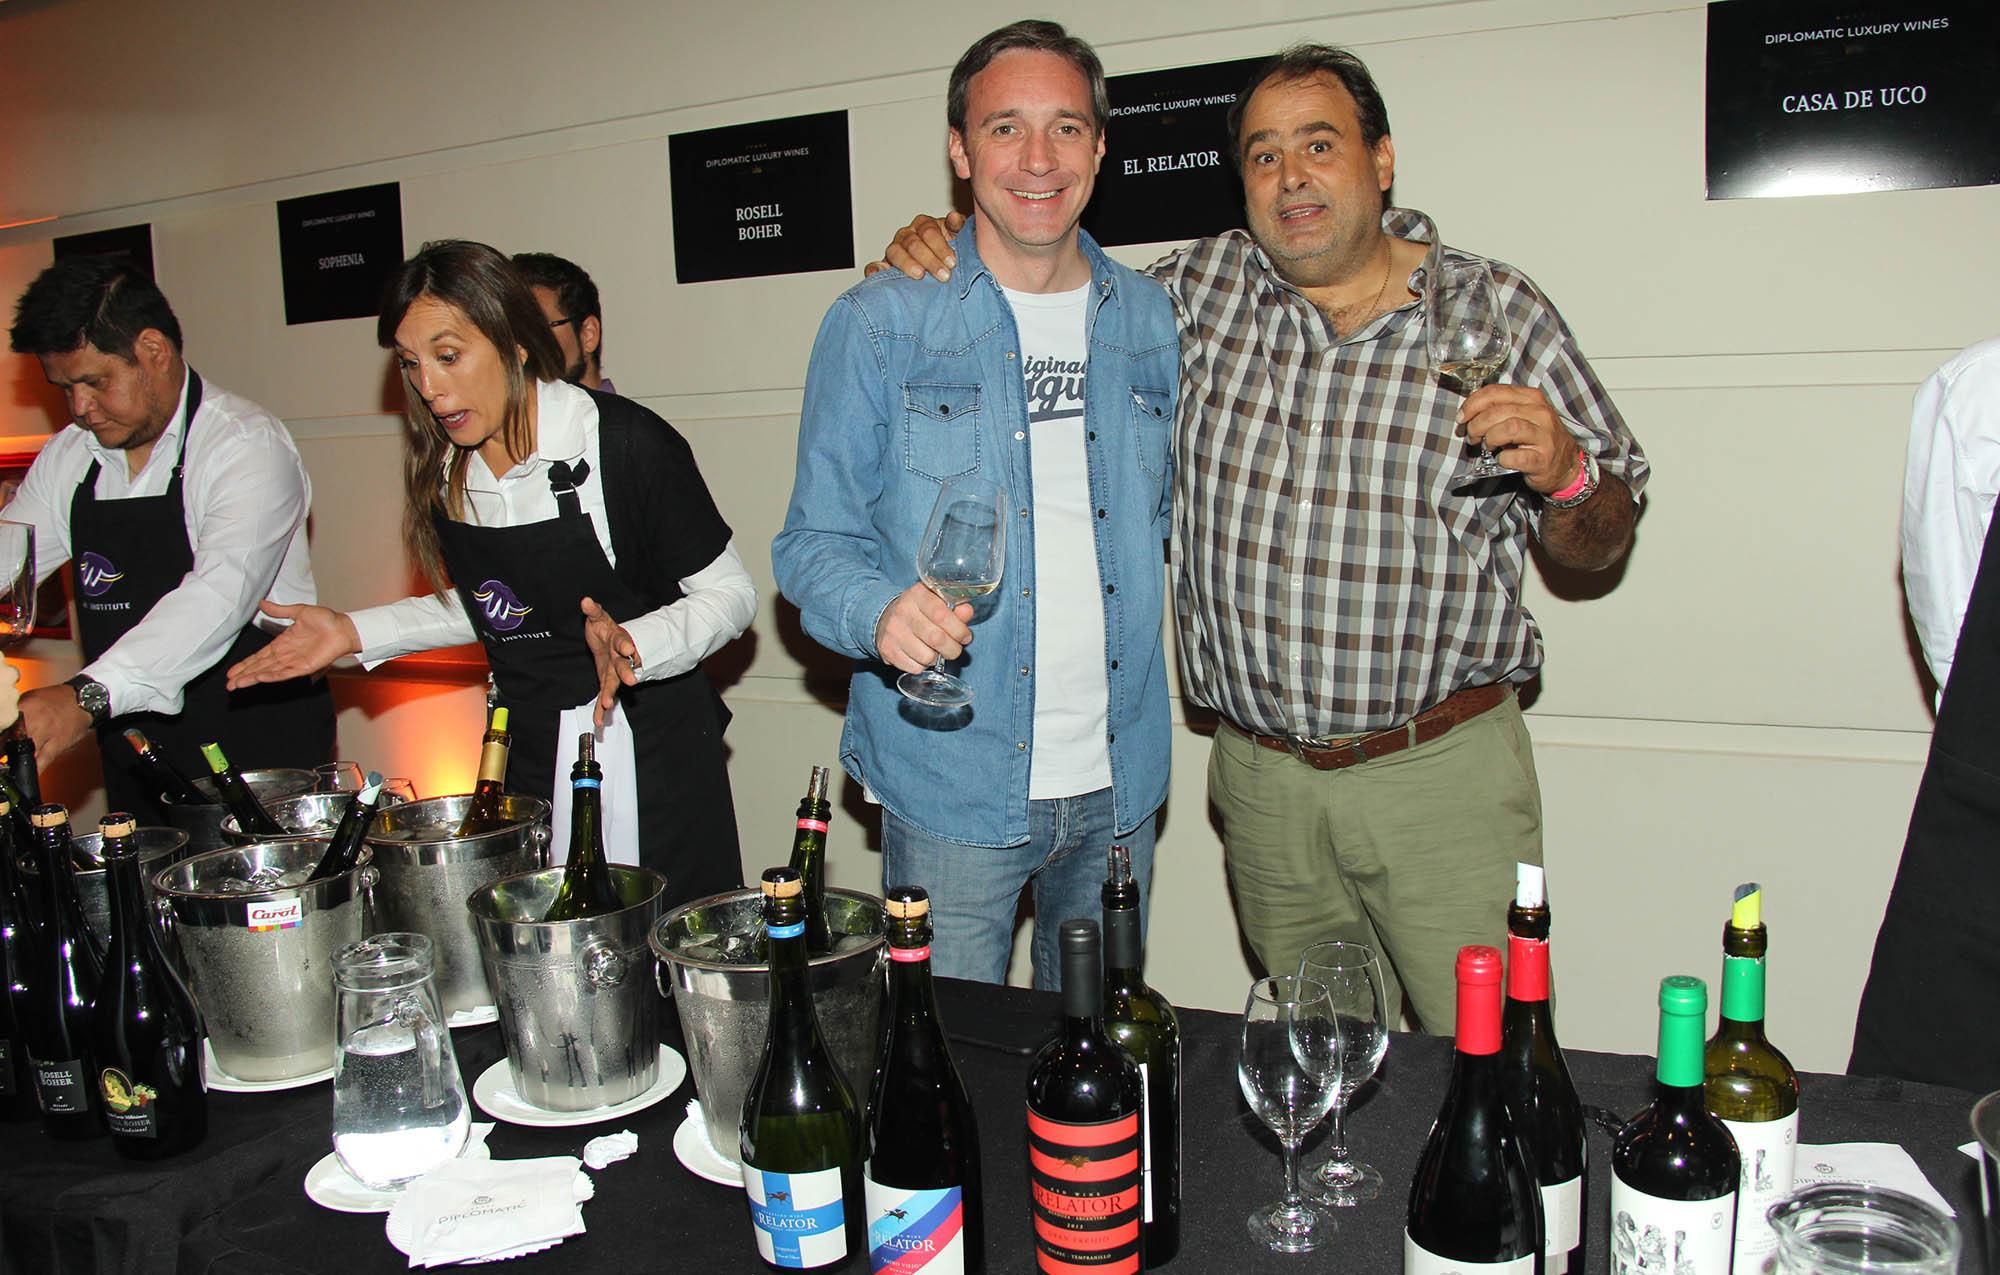 Fernado Gabrielli, El Relator vinos.